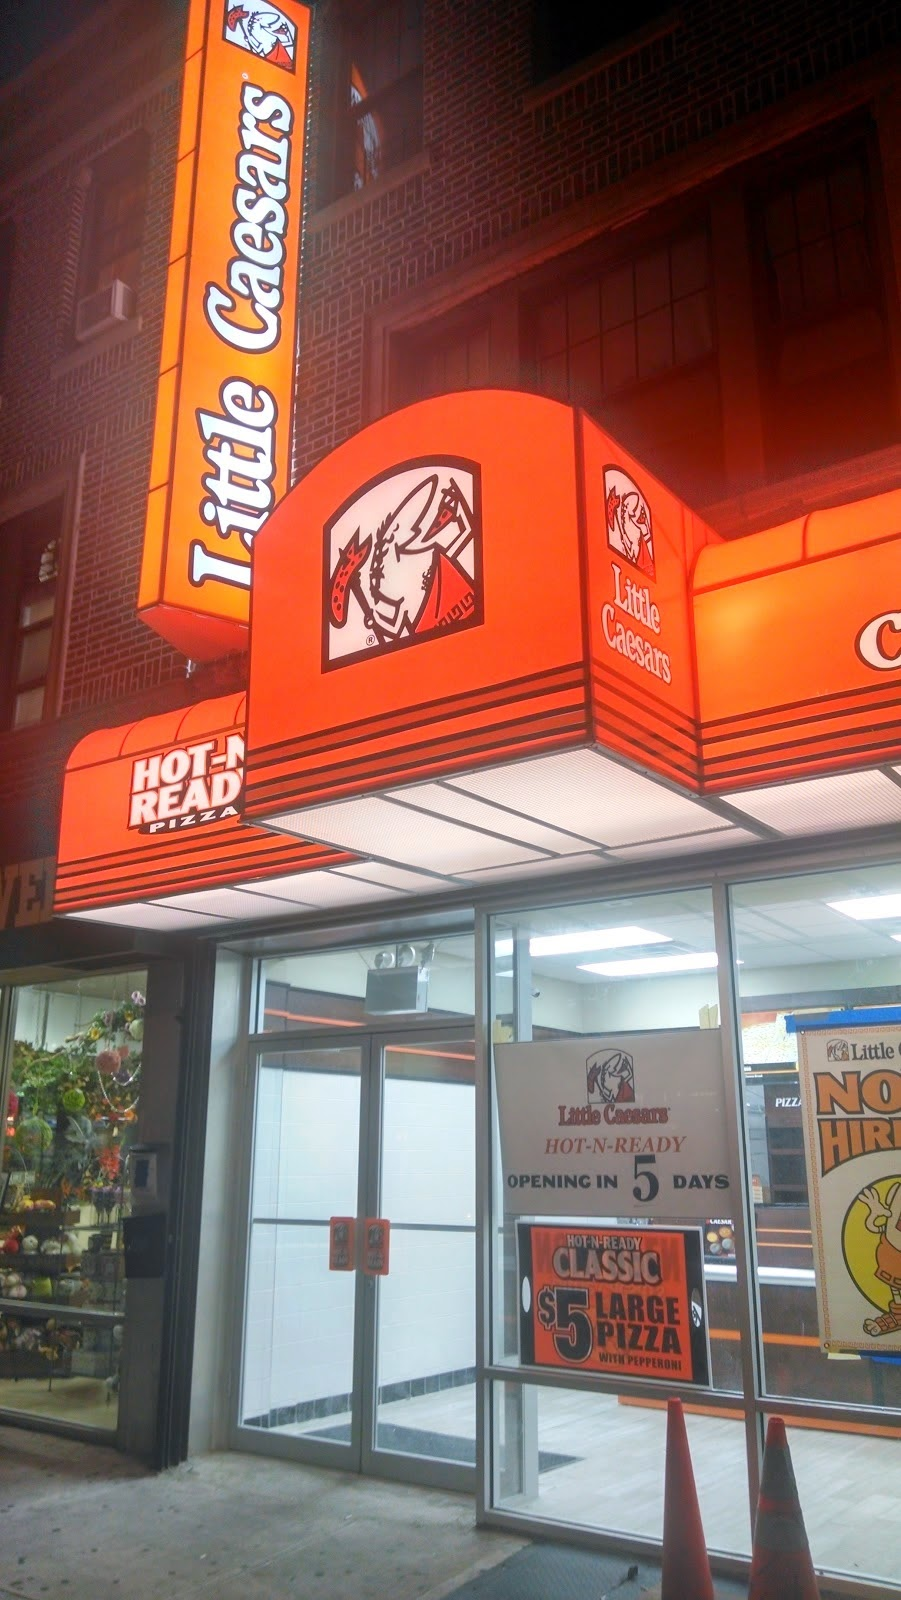 Pizza Hut's Pretzel Piggy Pizza is part of their new